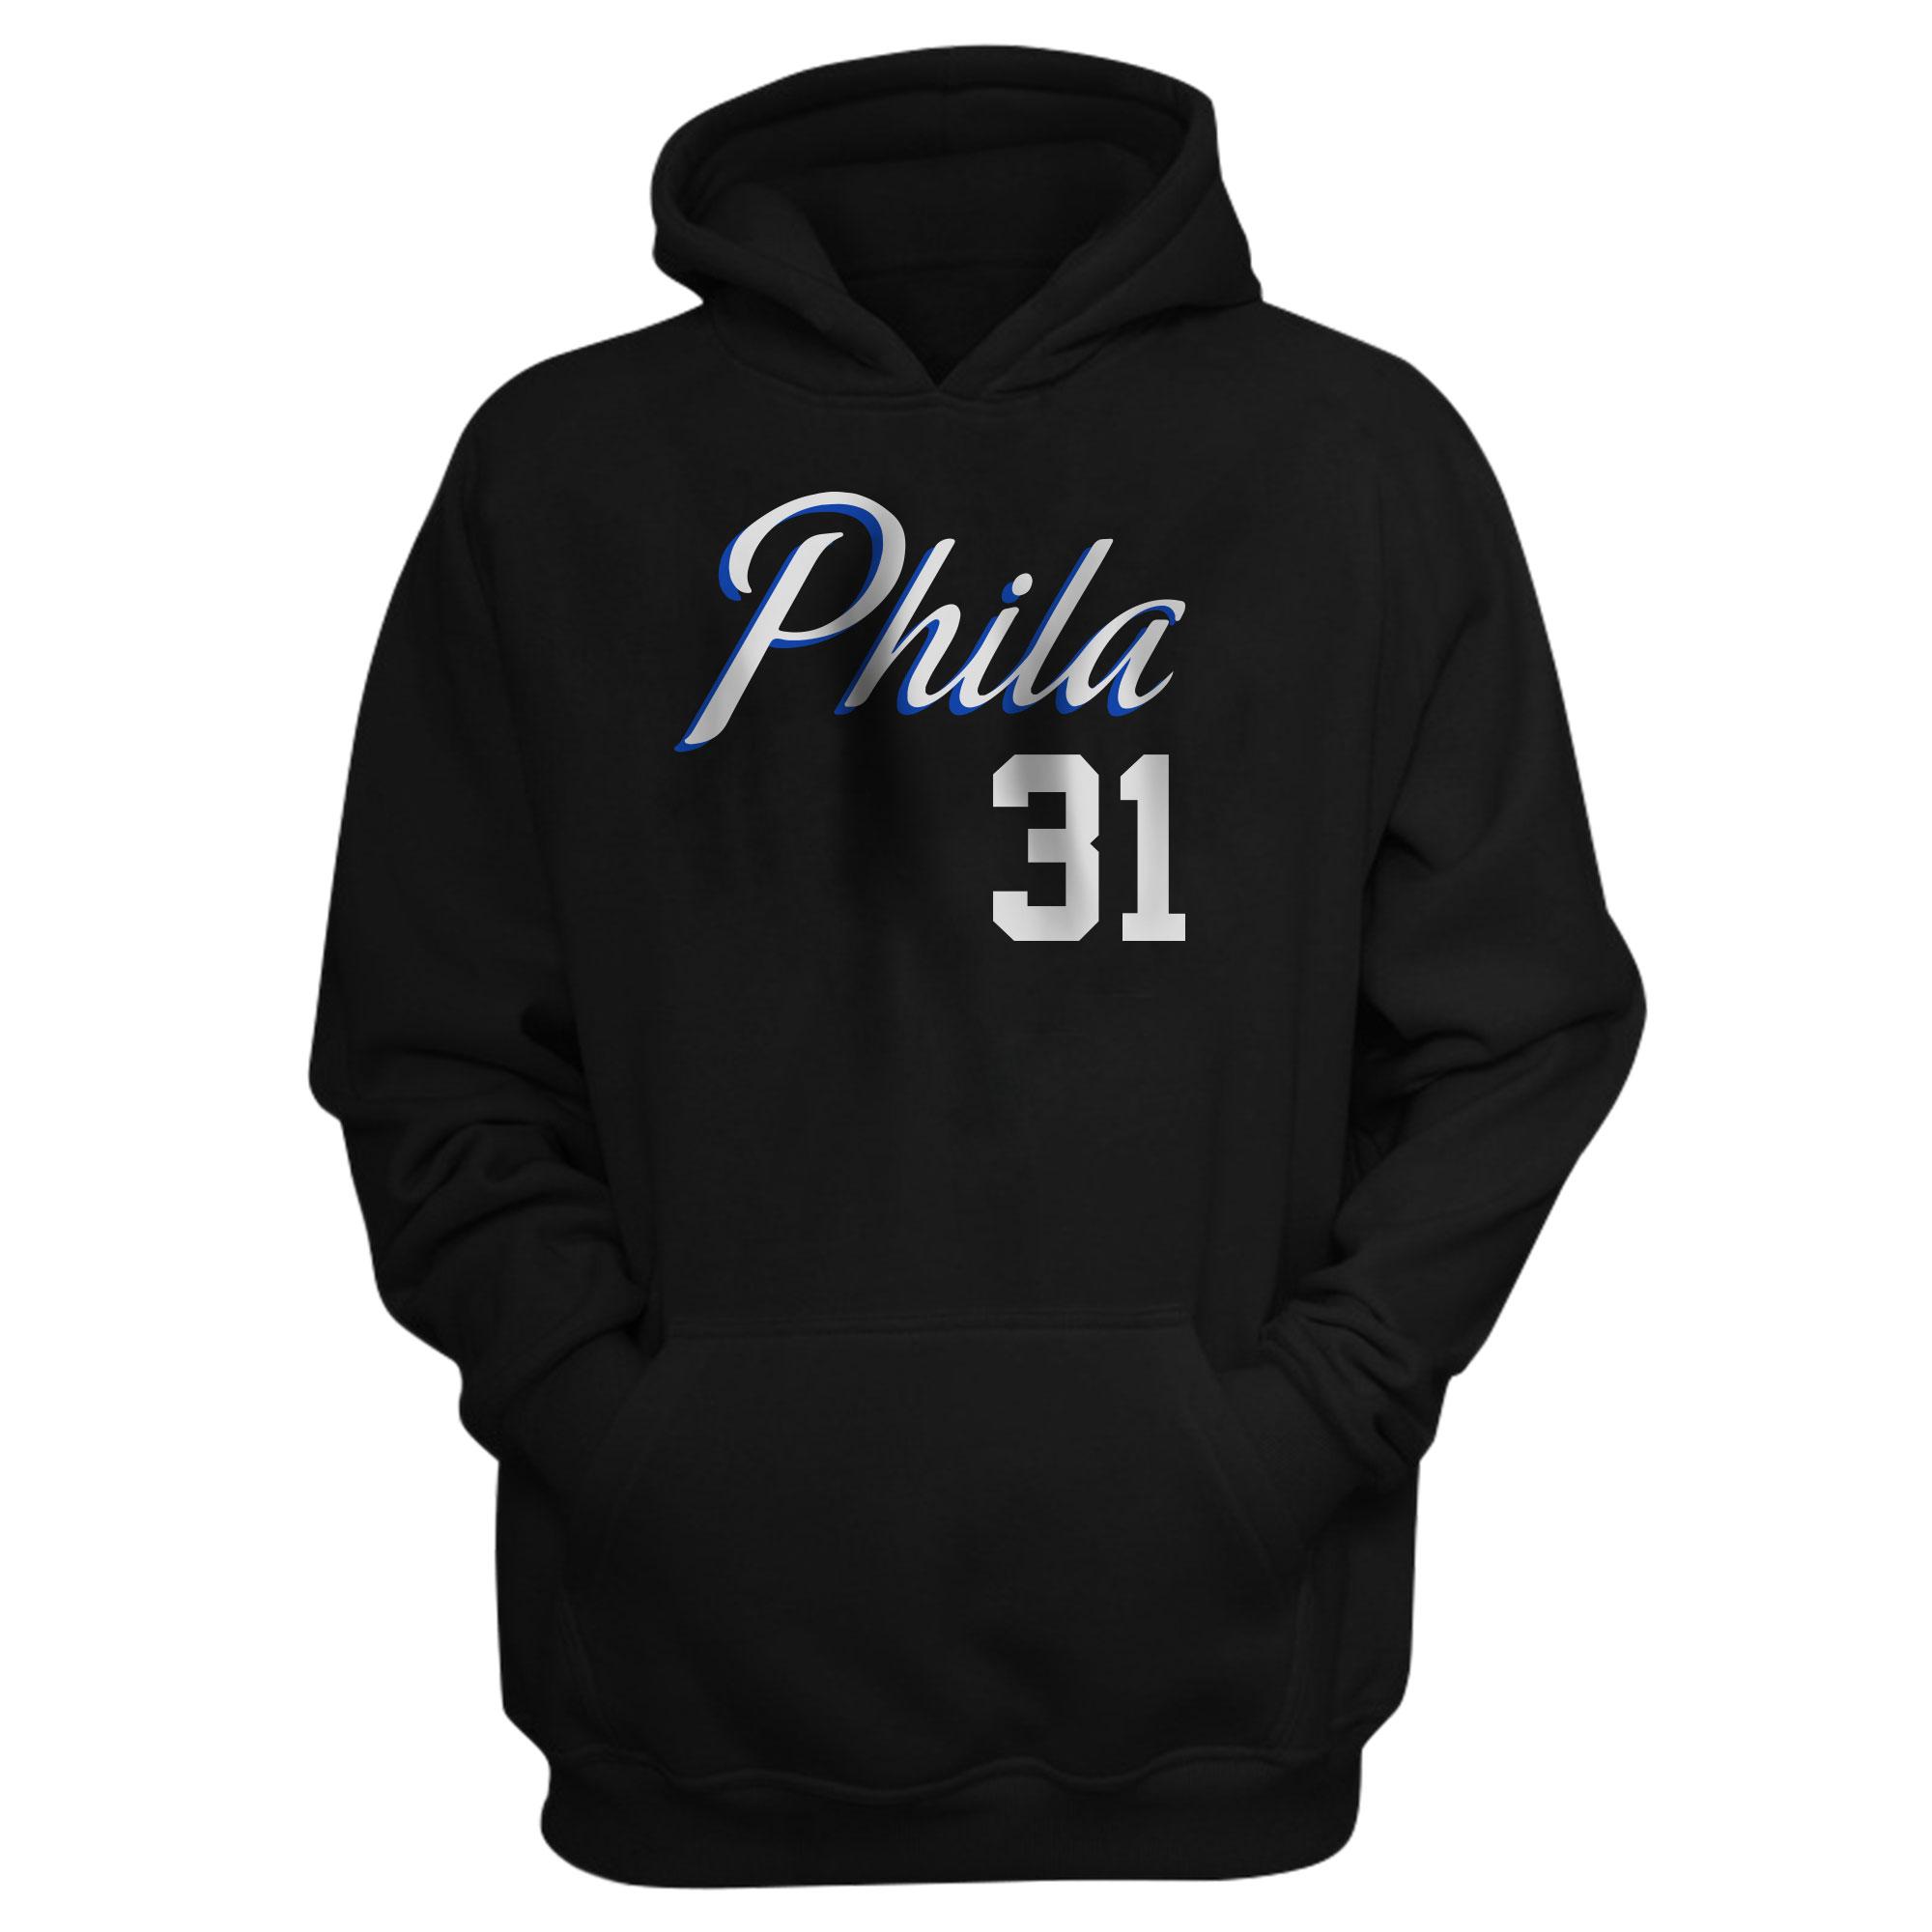 Philadelphia 76ers Seth Curry  Hoodie (HD-BLC-NP-504-31)